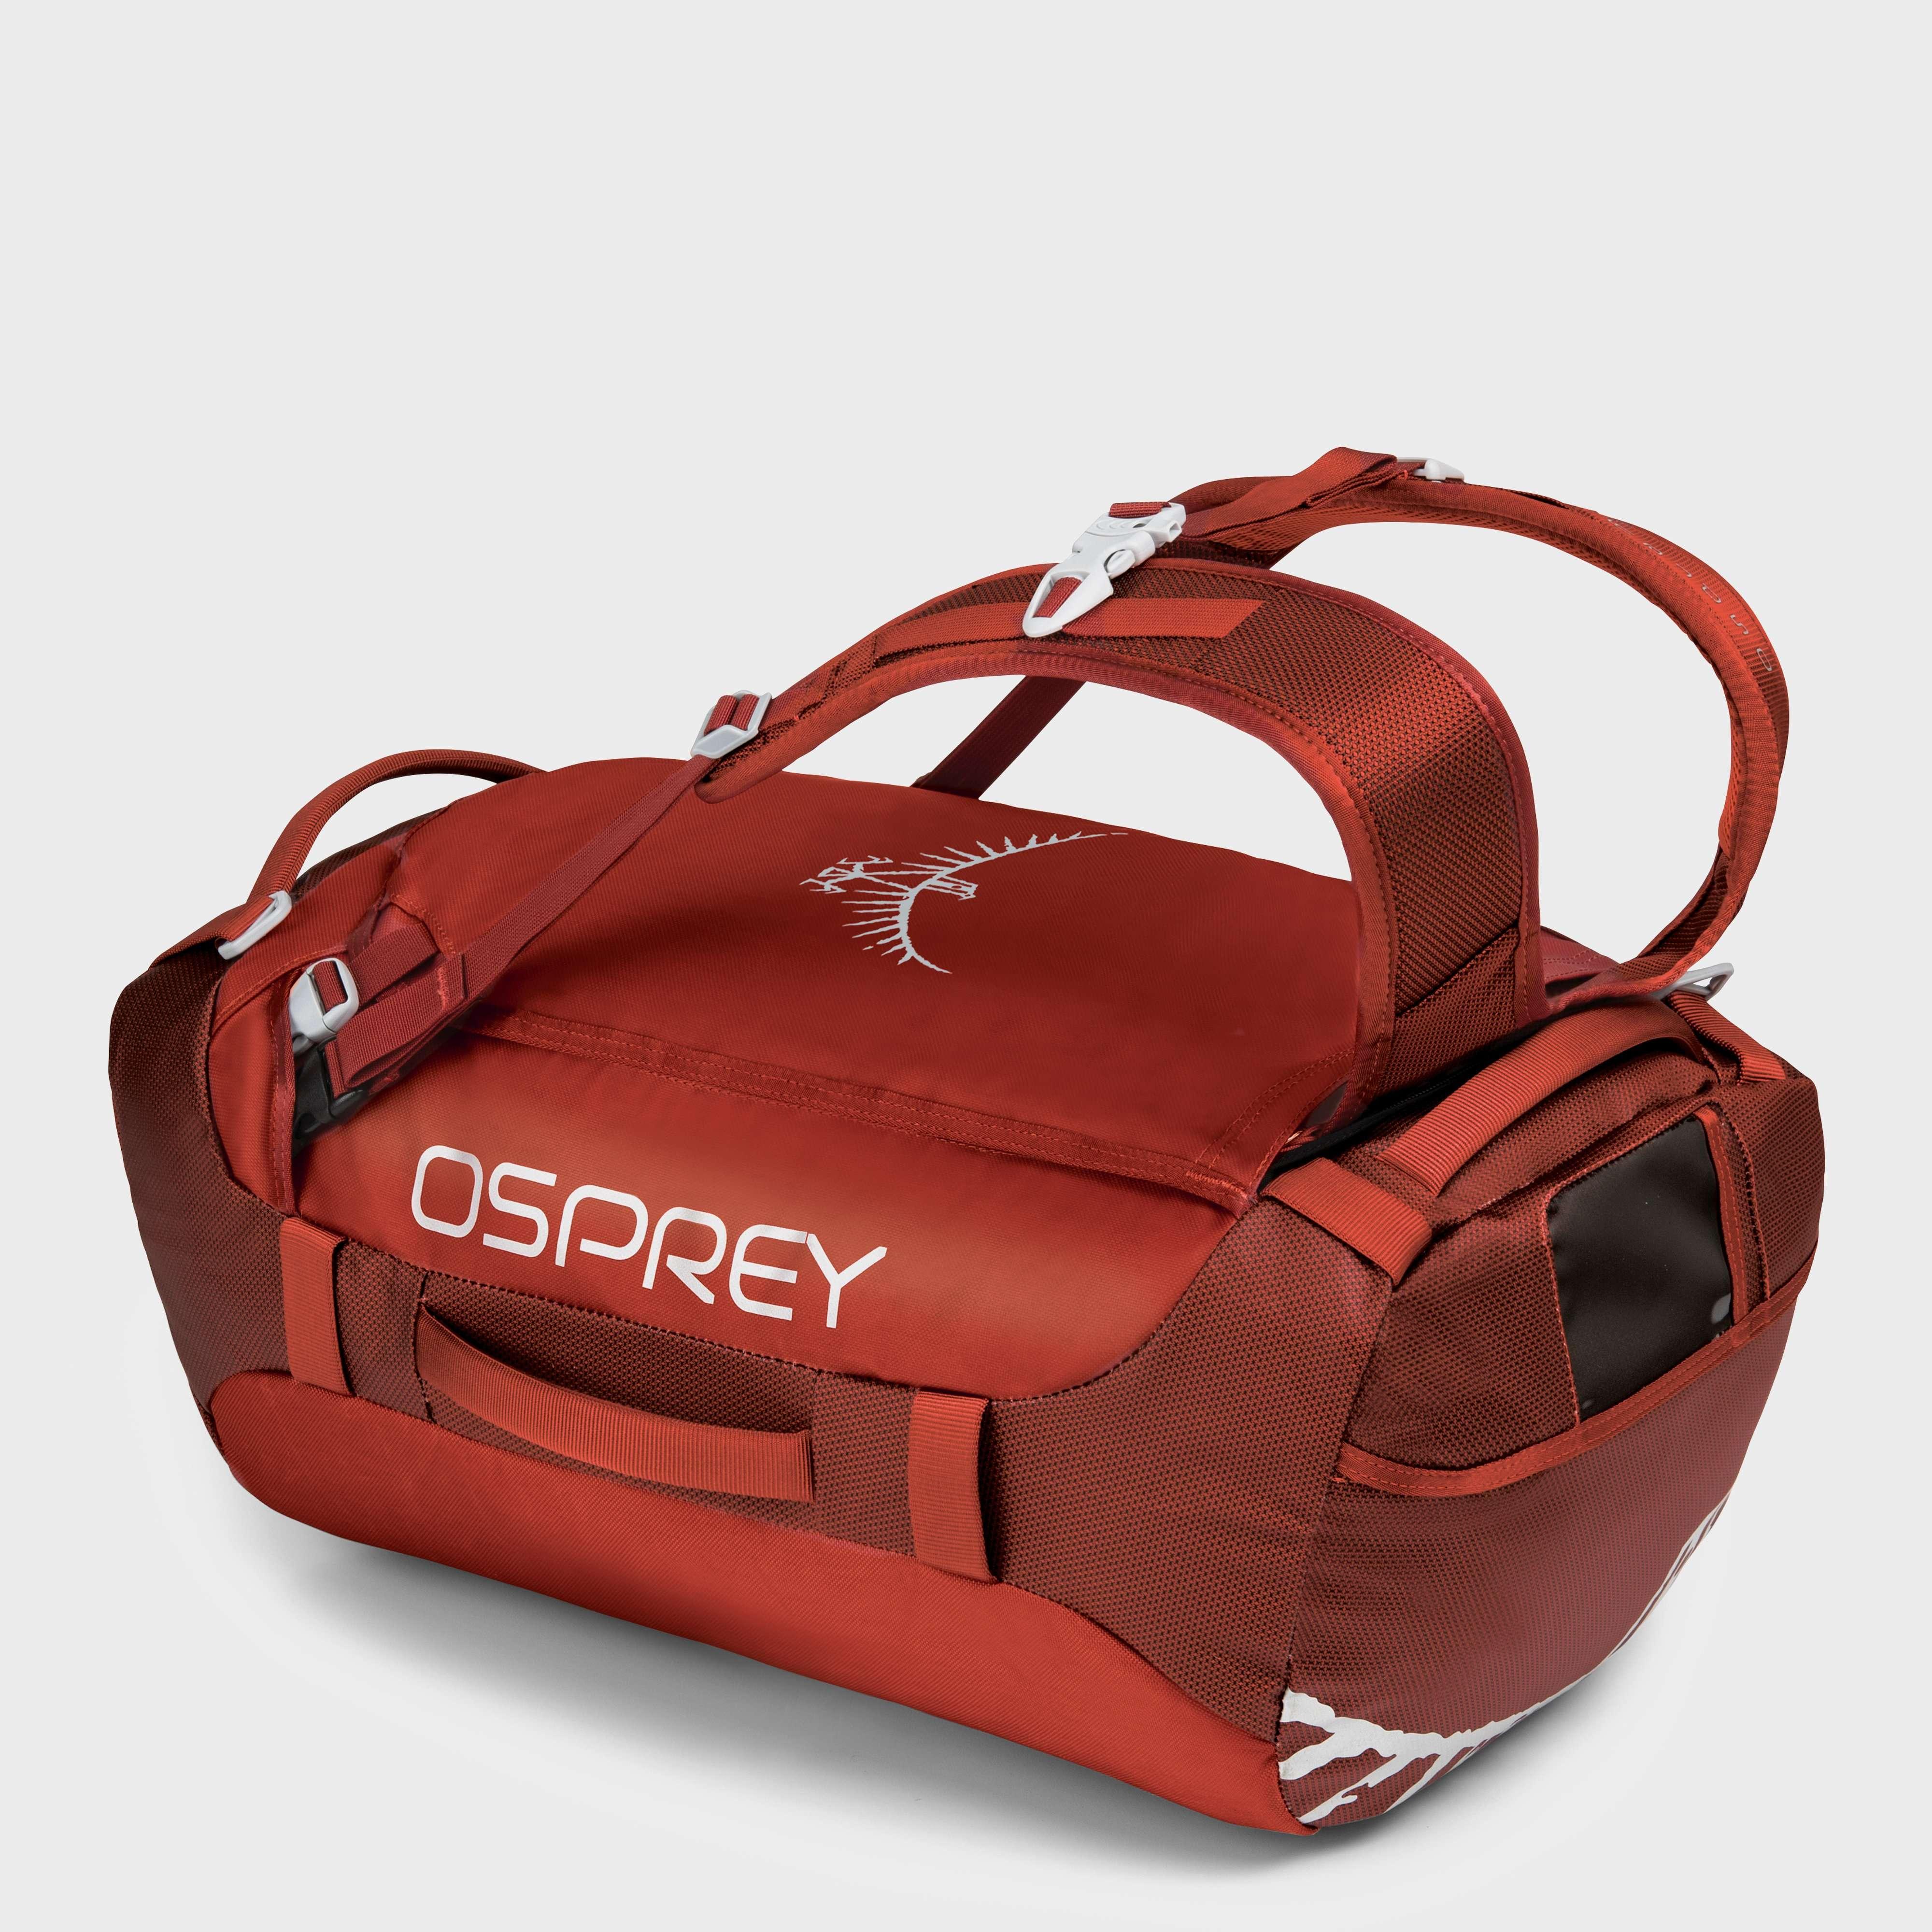 OSPREY Transporter 95 Litre Holdall